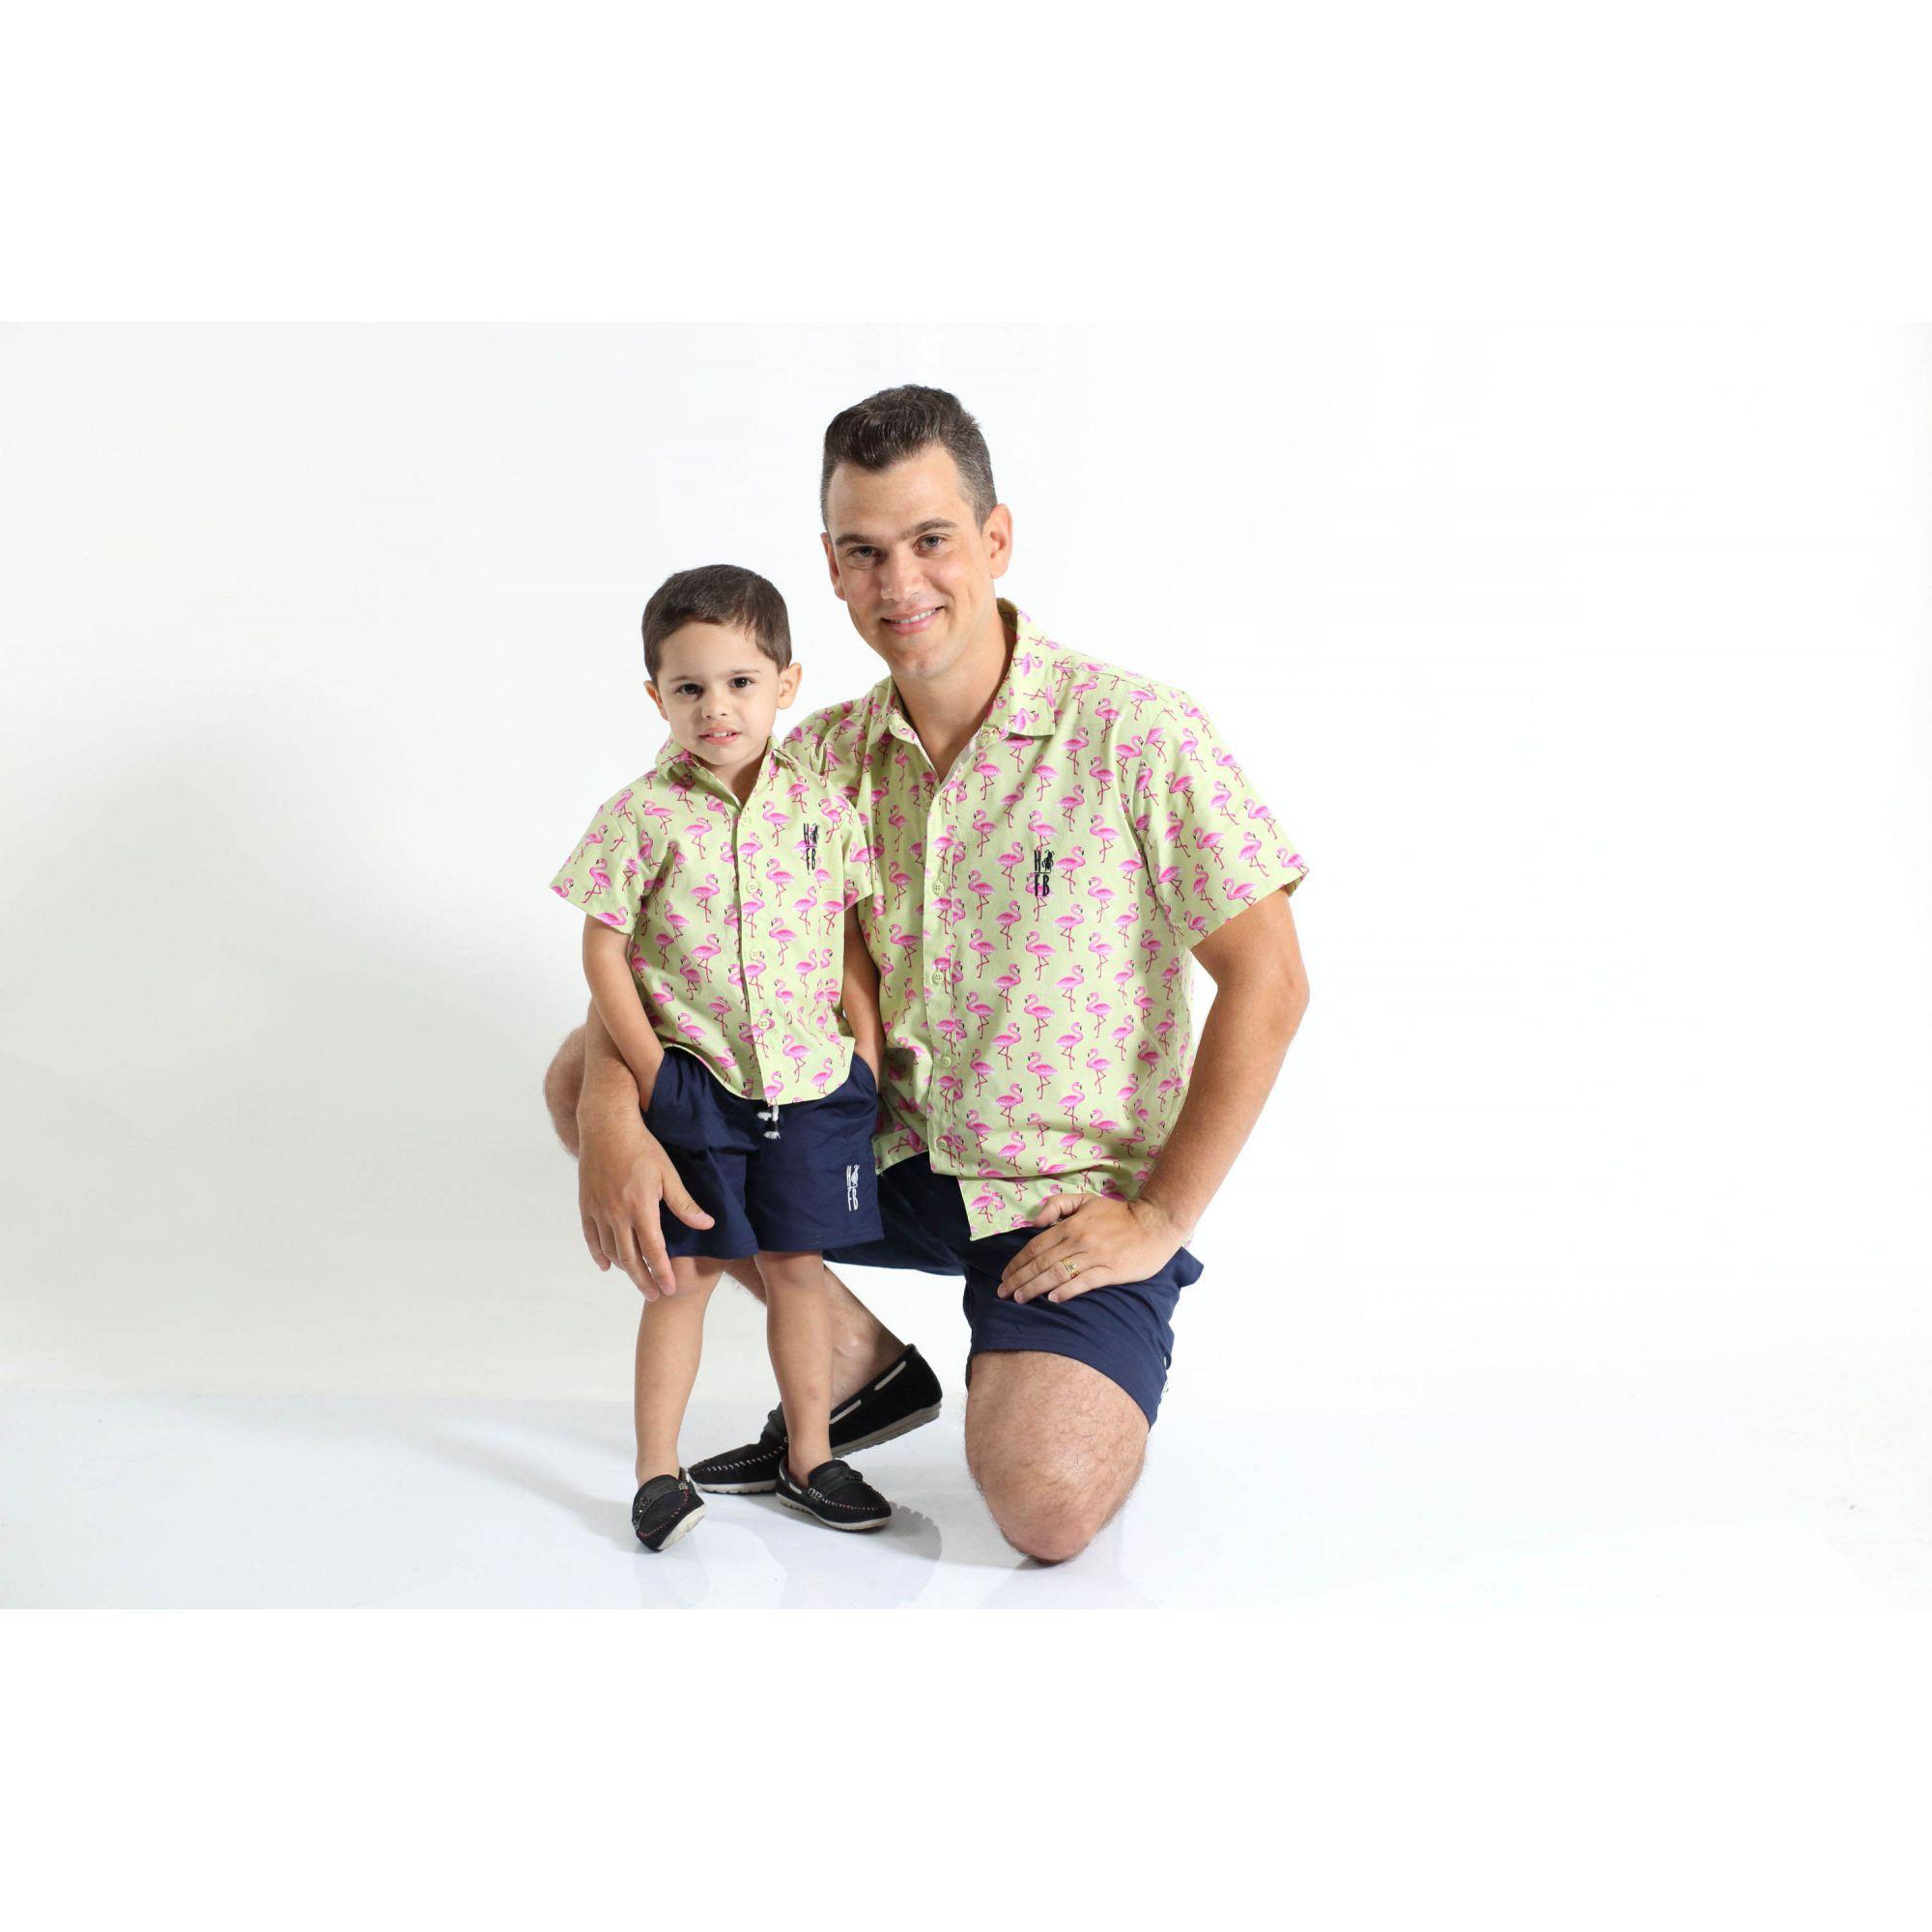 PAI E FILHO > Kit 02 Camisas Manga Curta Flamingo  [Coleção Tal Pai Tal Filho]  - Heitor Fashion Brazil